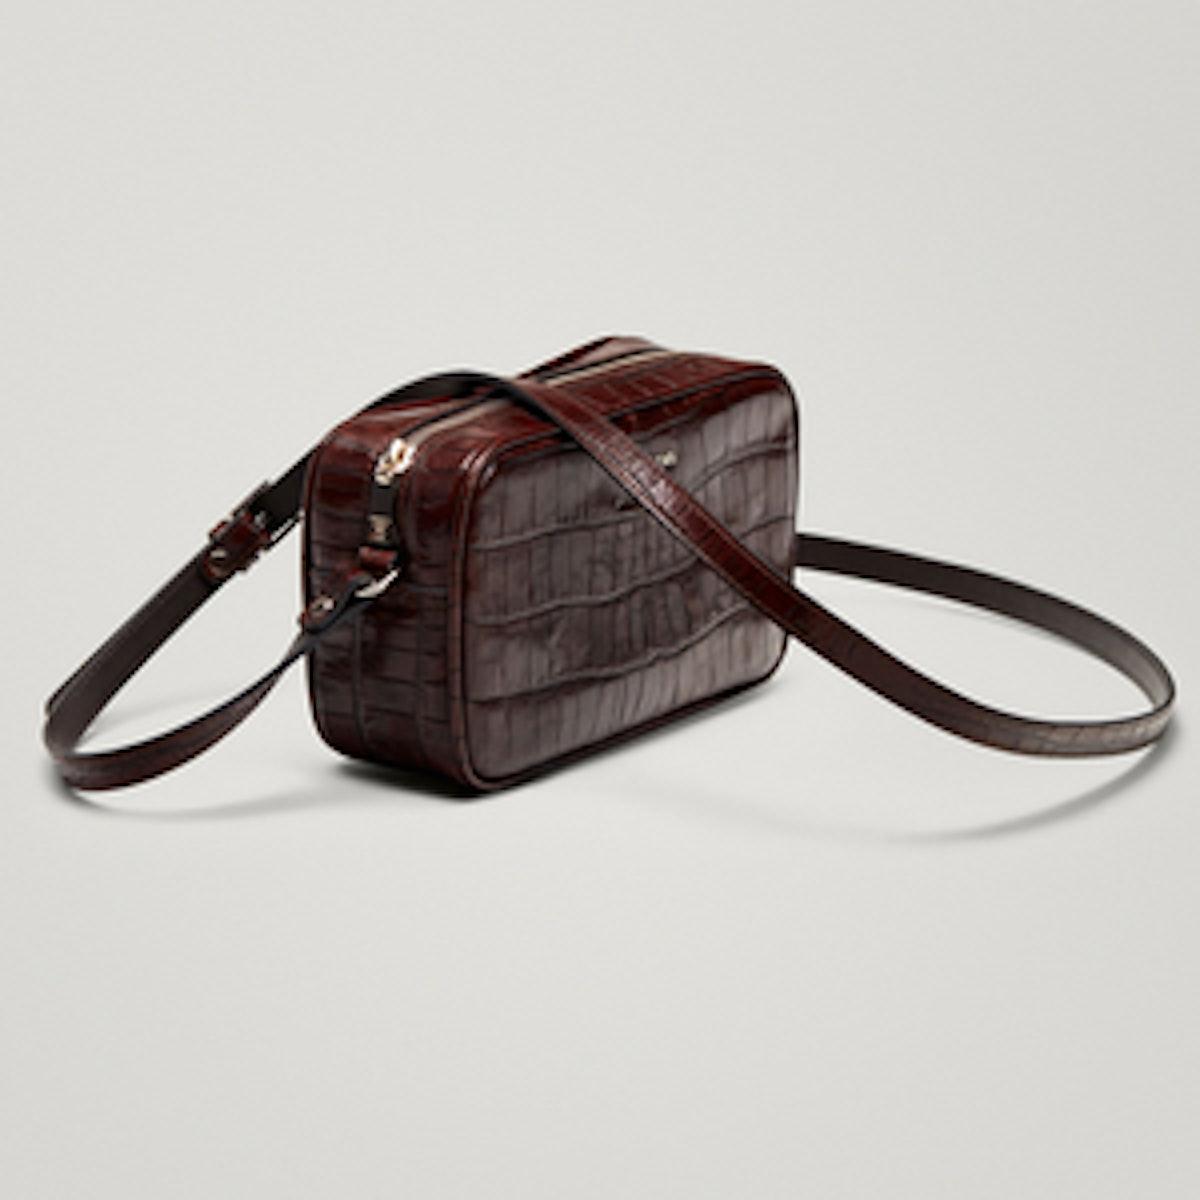 Leather Crossbody Bag With Mock Croc Finish